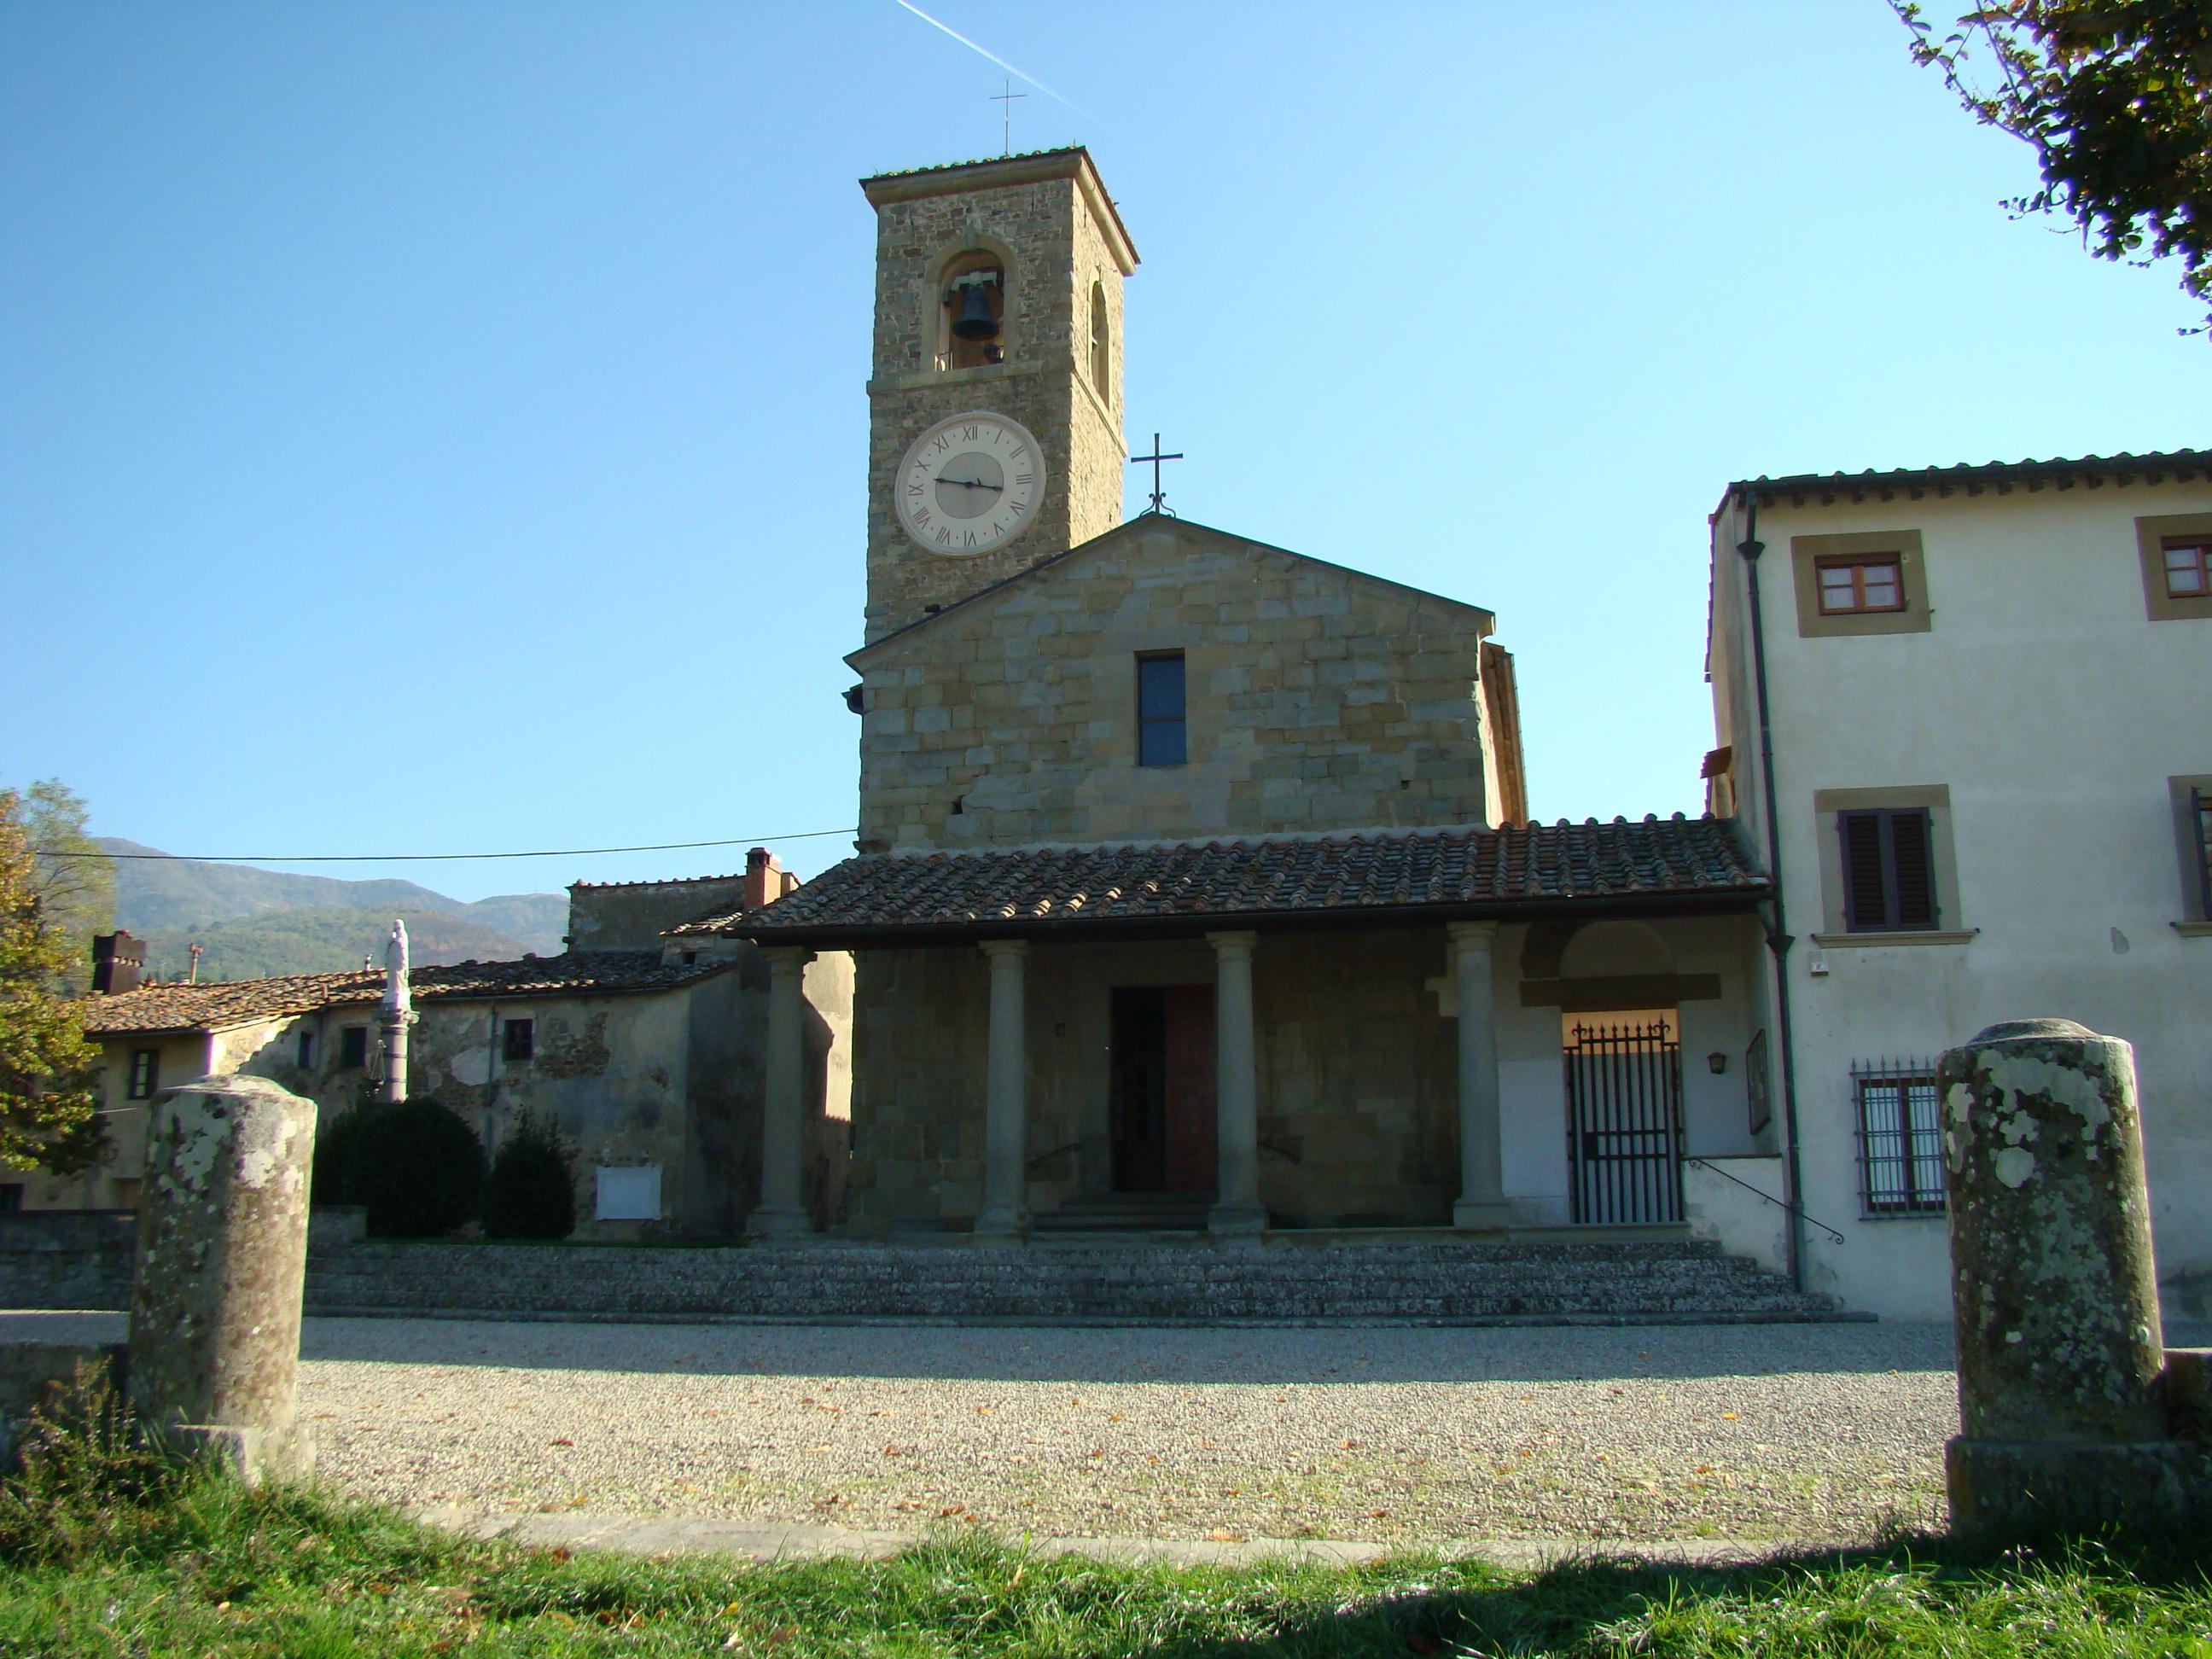 Pieve di Sant'Agata in Arfoli (di Giuliana Profeti)